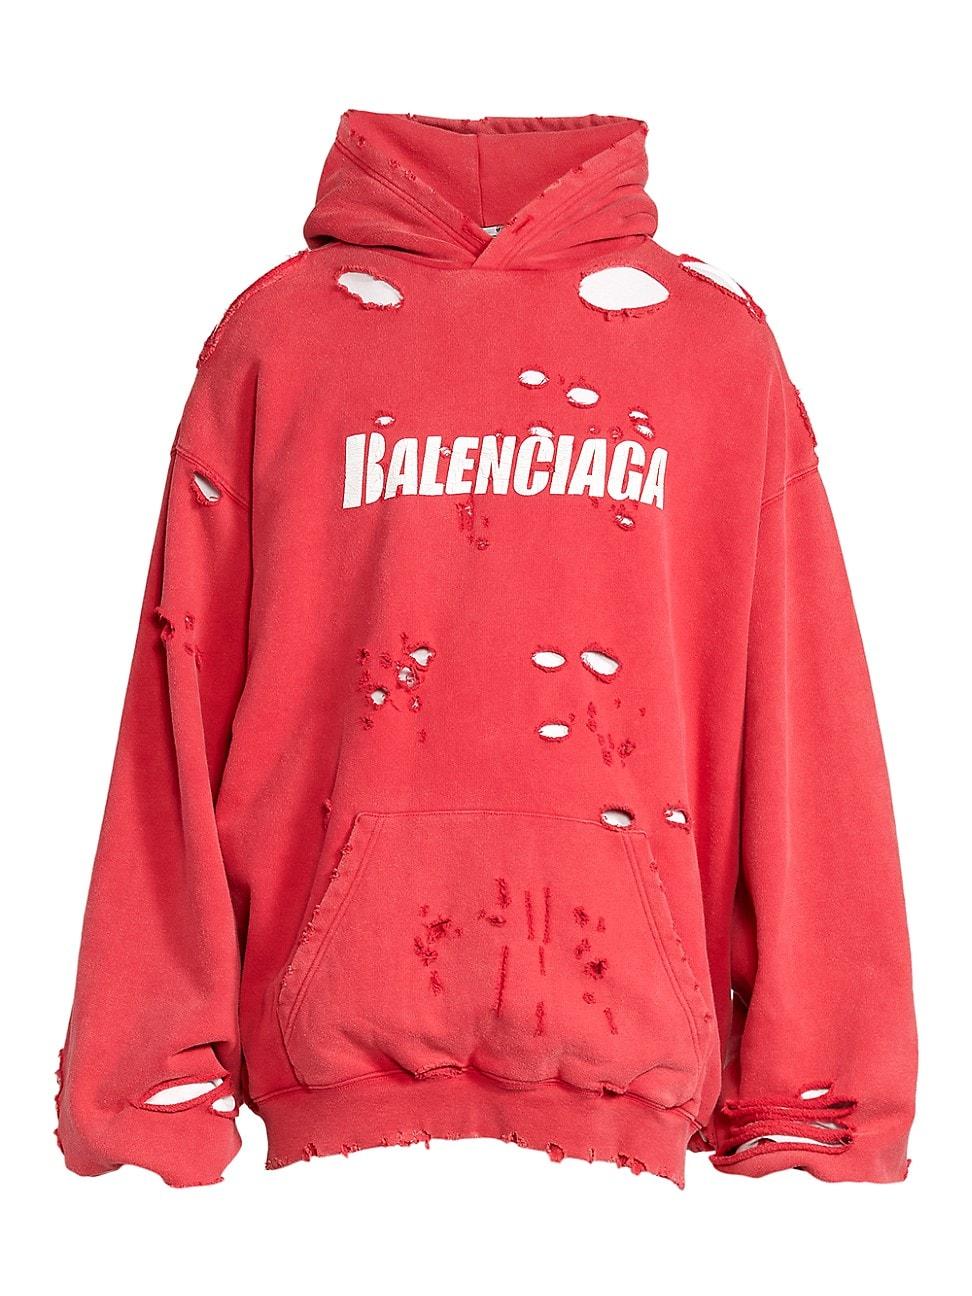 Balenciaga Hoodies MEN'S DESTROYED LOGO HOODIE